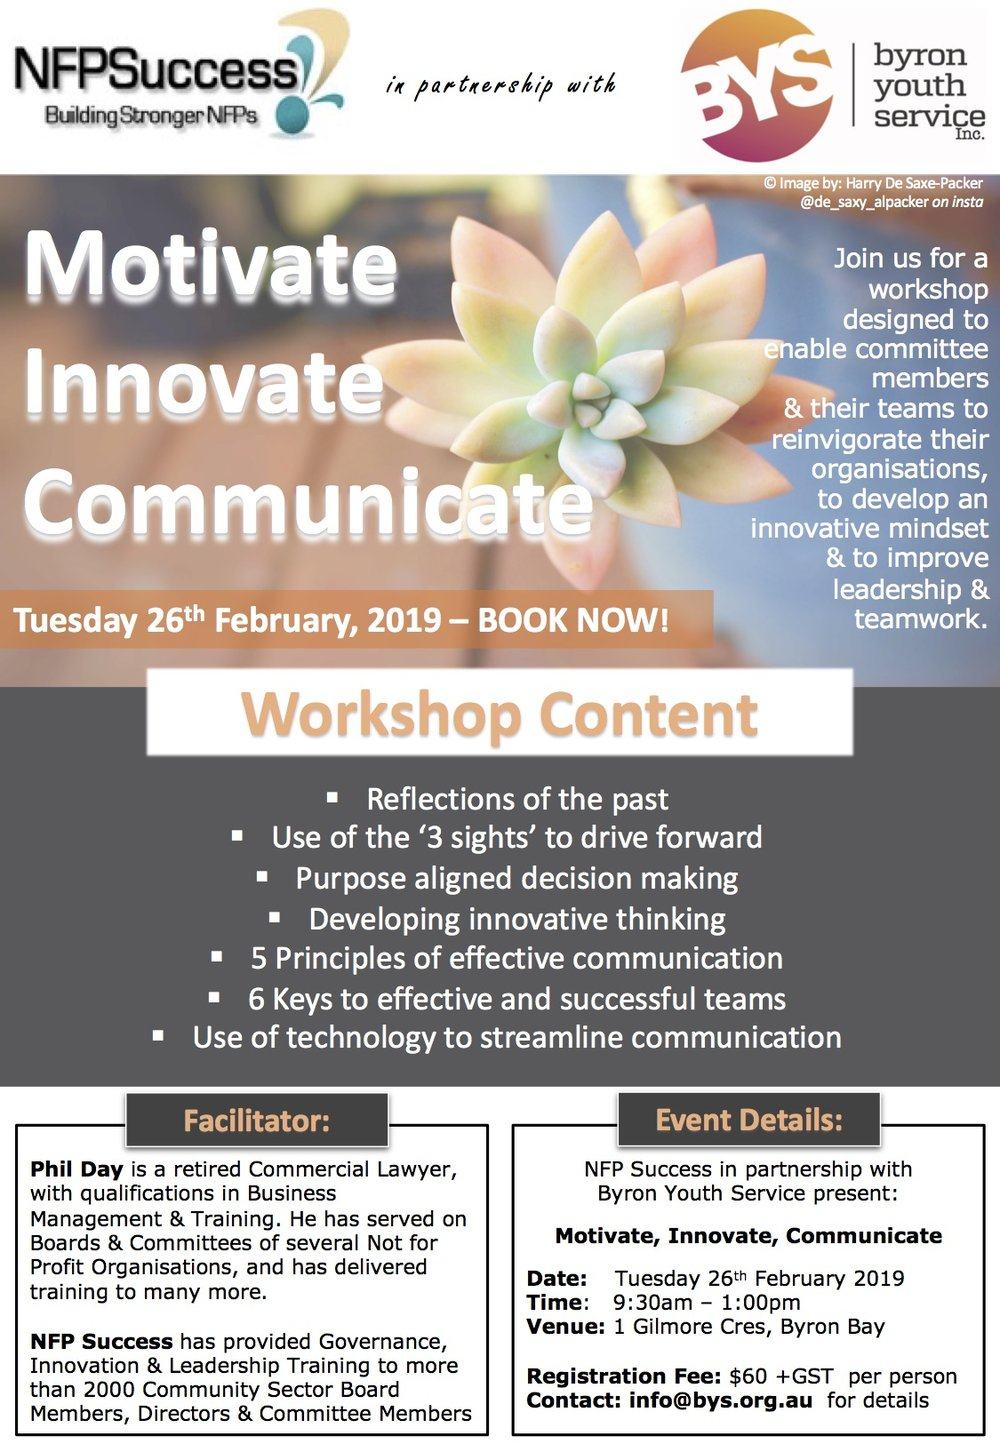 BYS & NFPS Workshop Invite copy.jpg